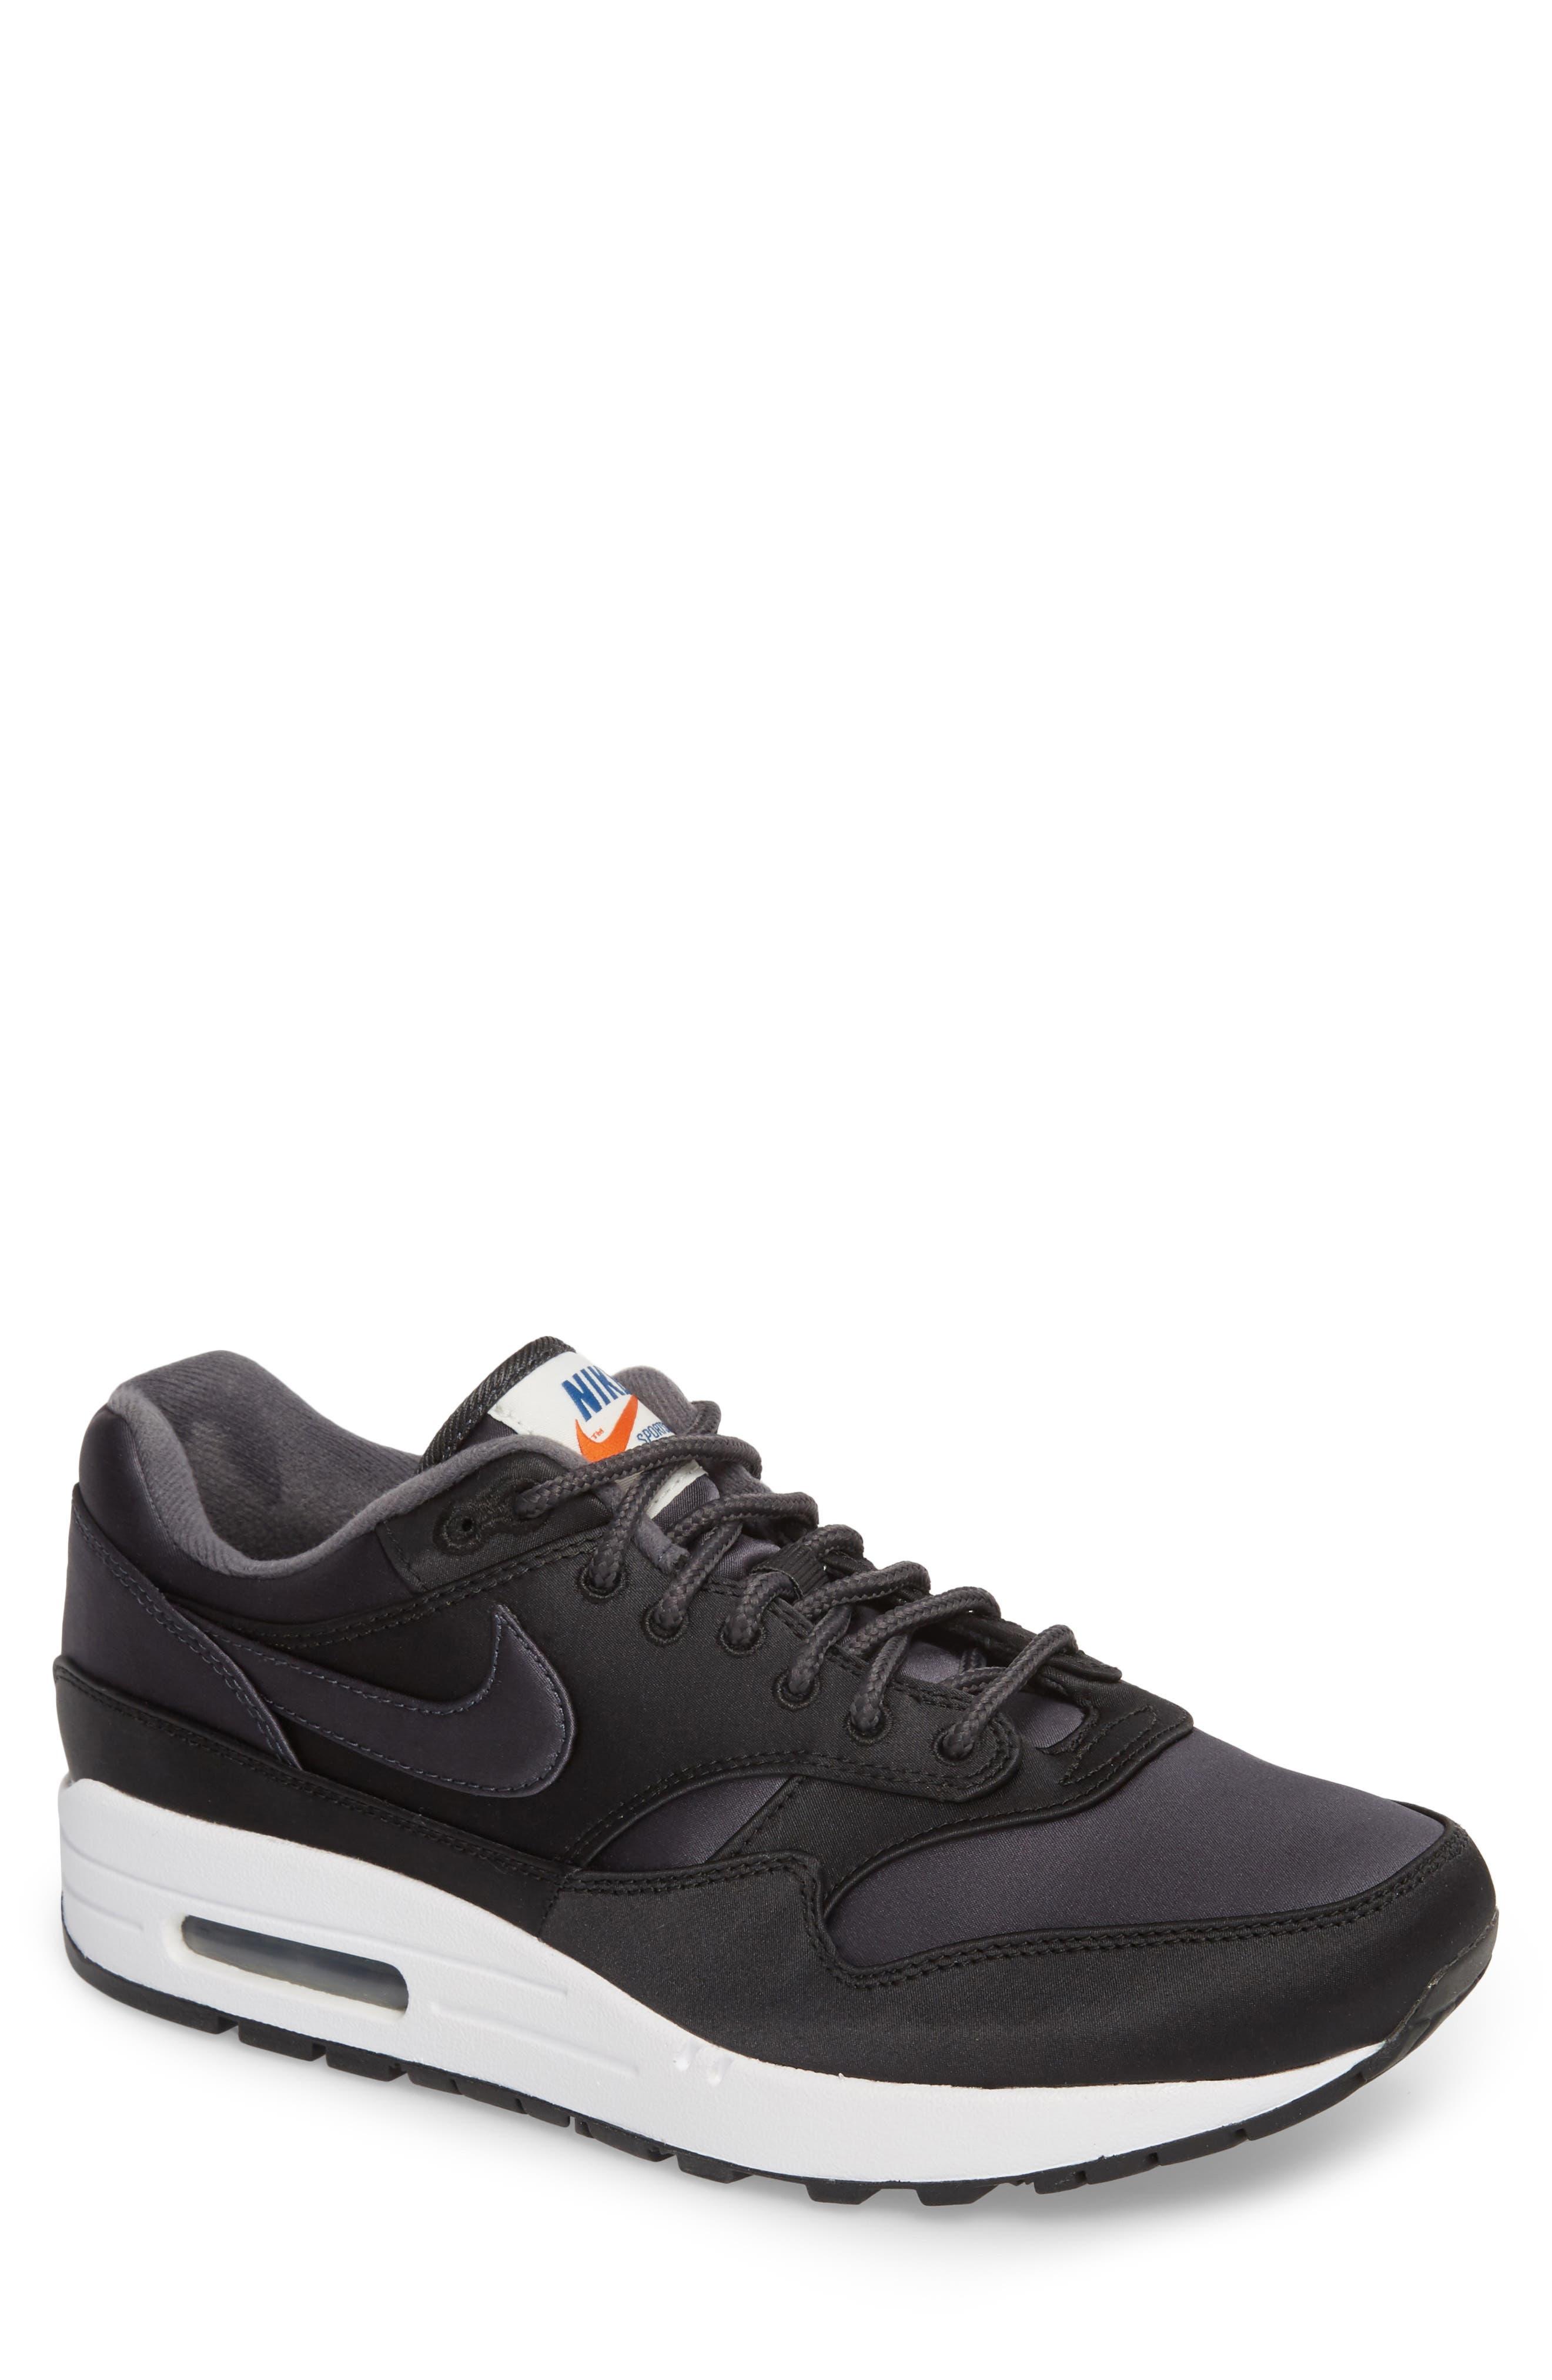 Air Max 1 SE Sneaker,                         Main,                         color, Black/ Anthracite/ White